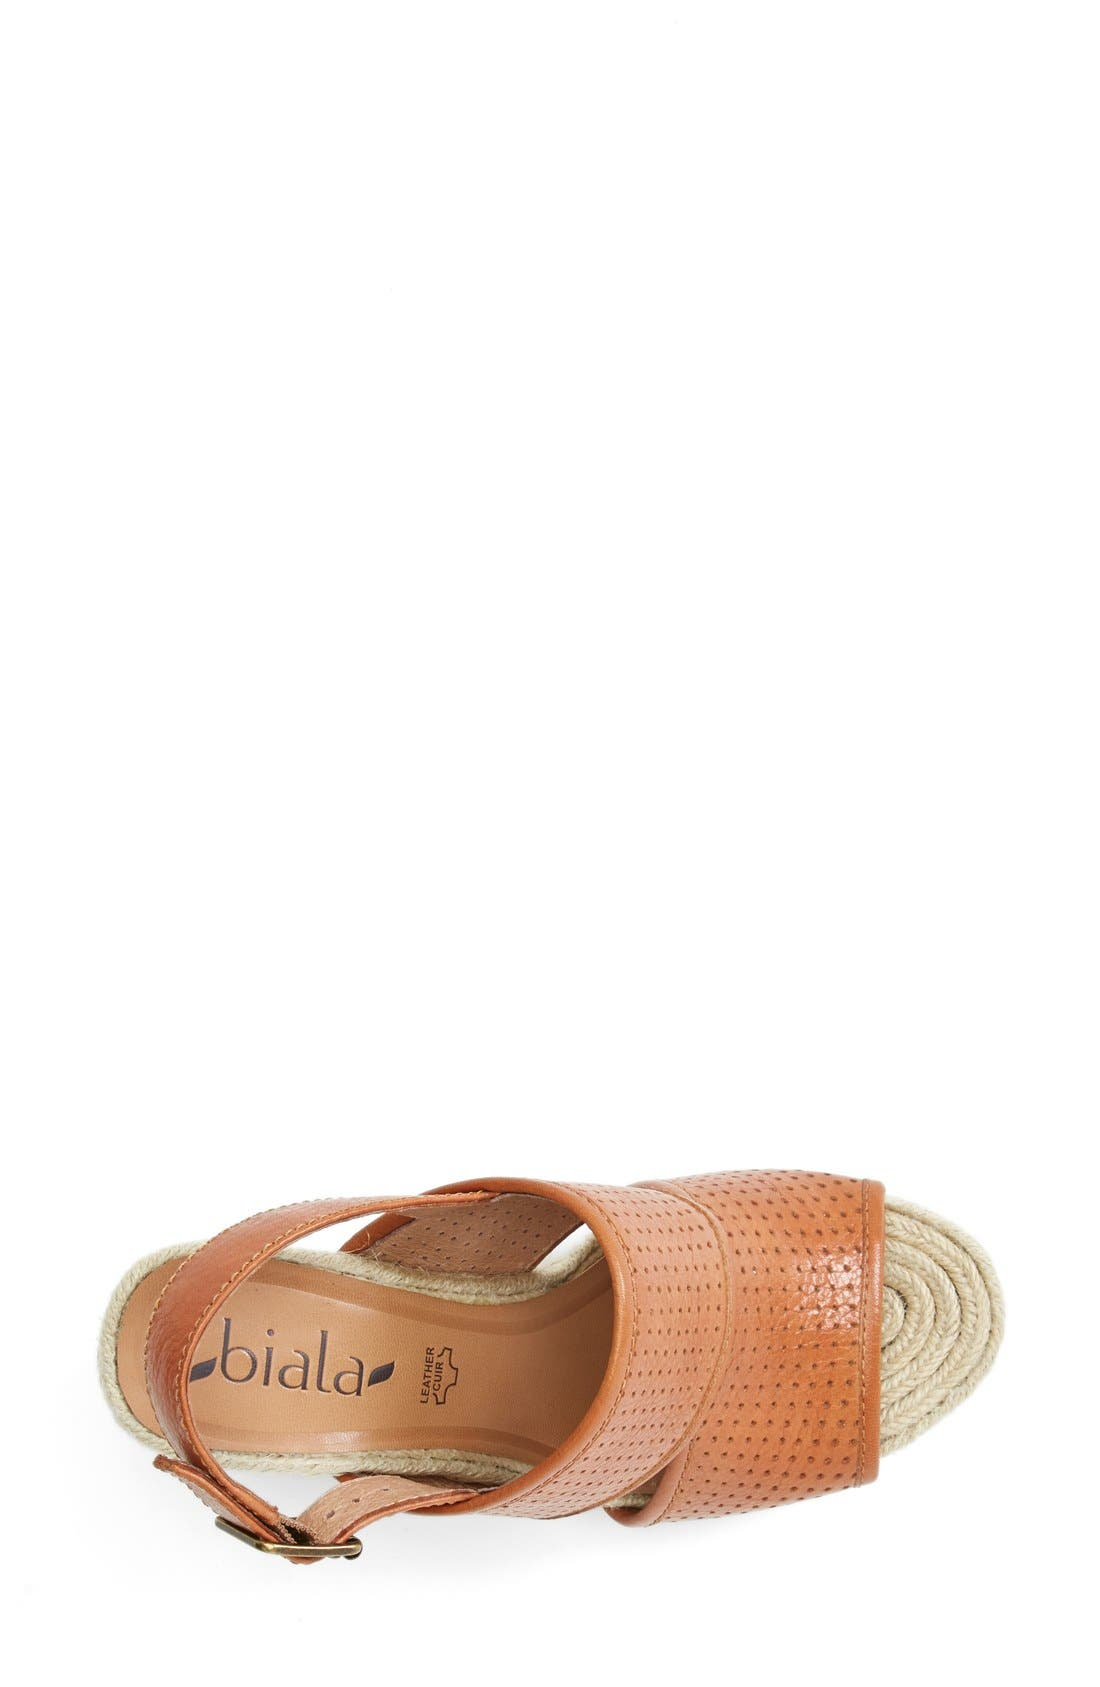 Alternate Image 3  - Biala 'Joyce' Perforated Espadrille Wedge Sandal (Women)